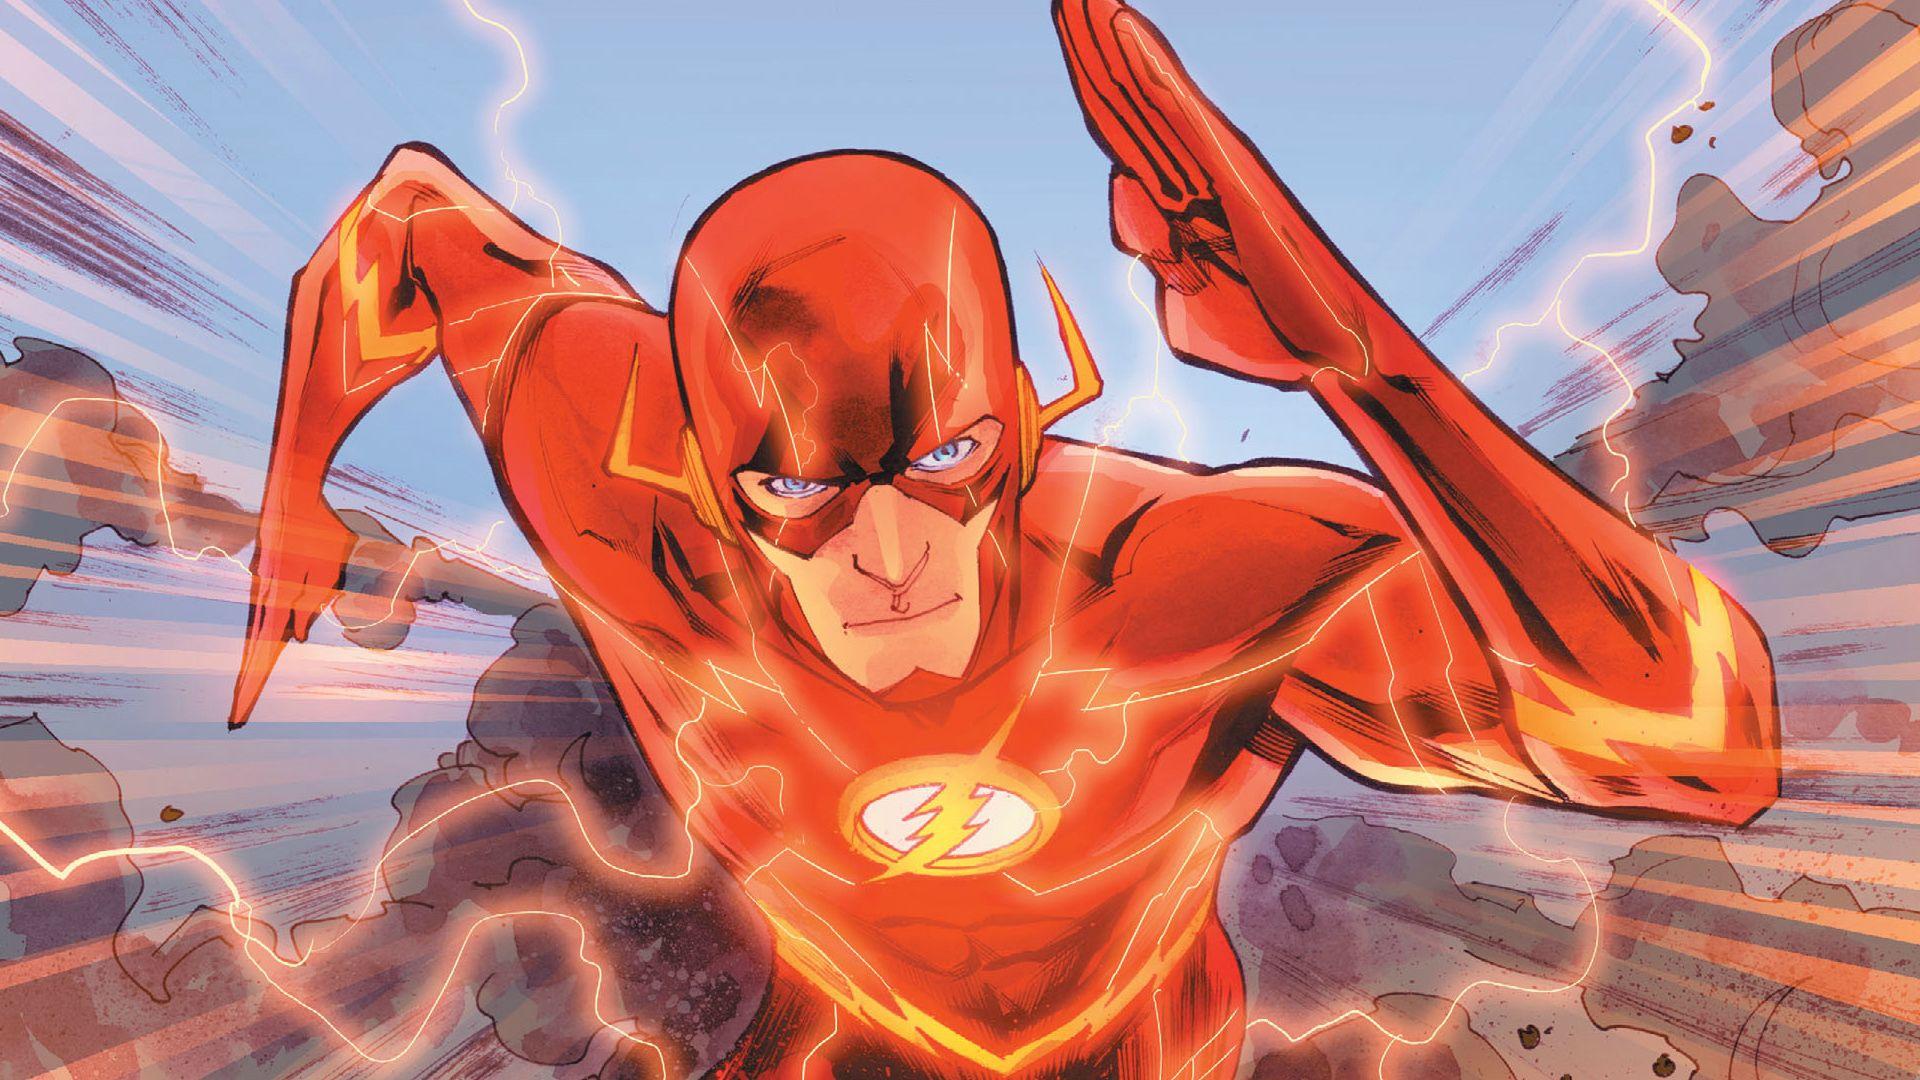 Flash Hd Wallpaper - Francis Manapul Flash (#894283) - HD ...